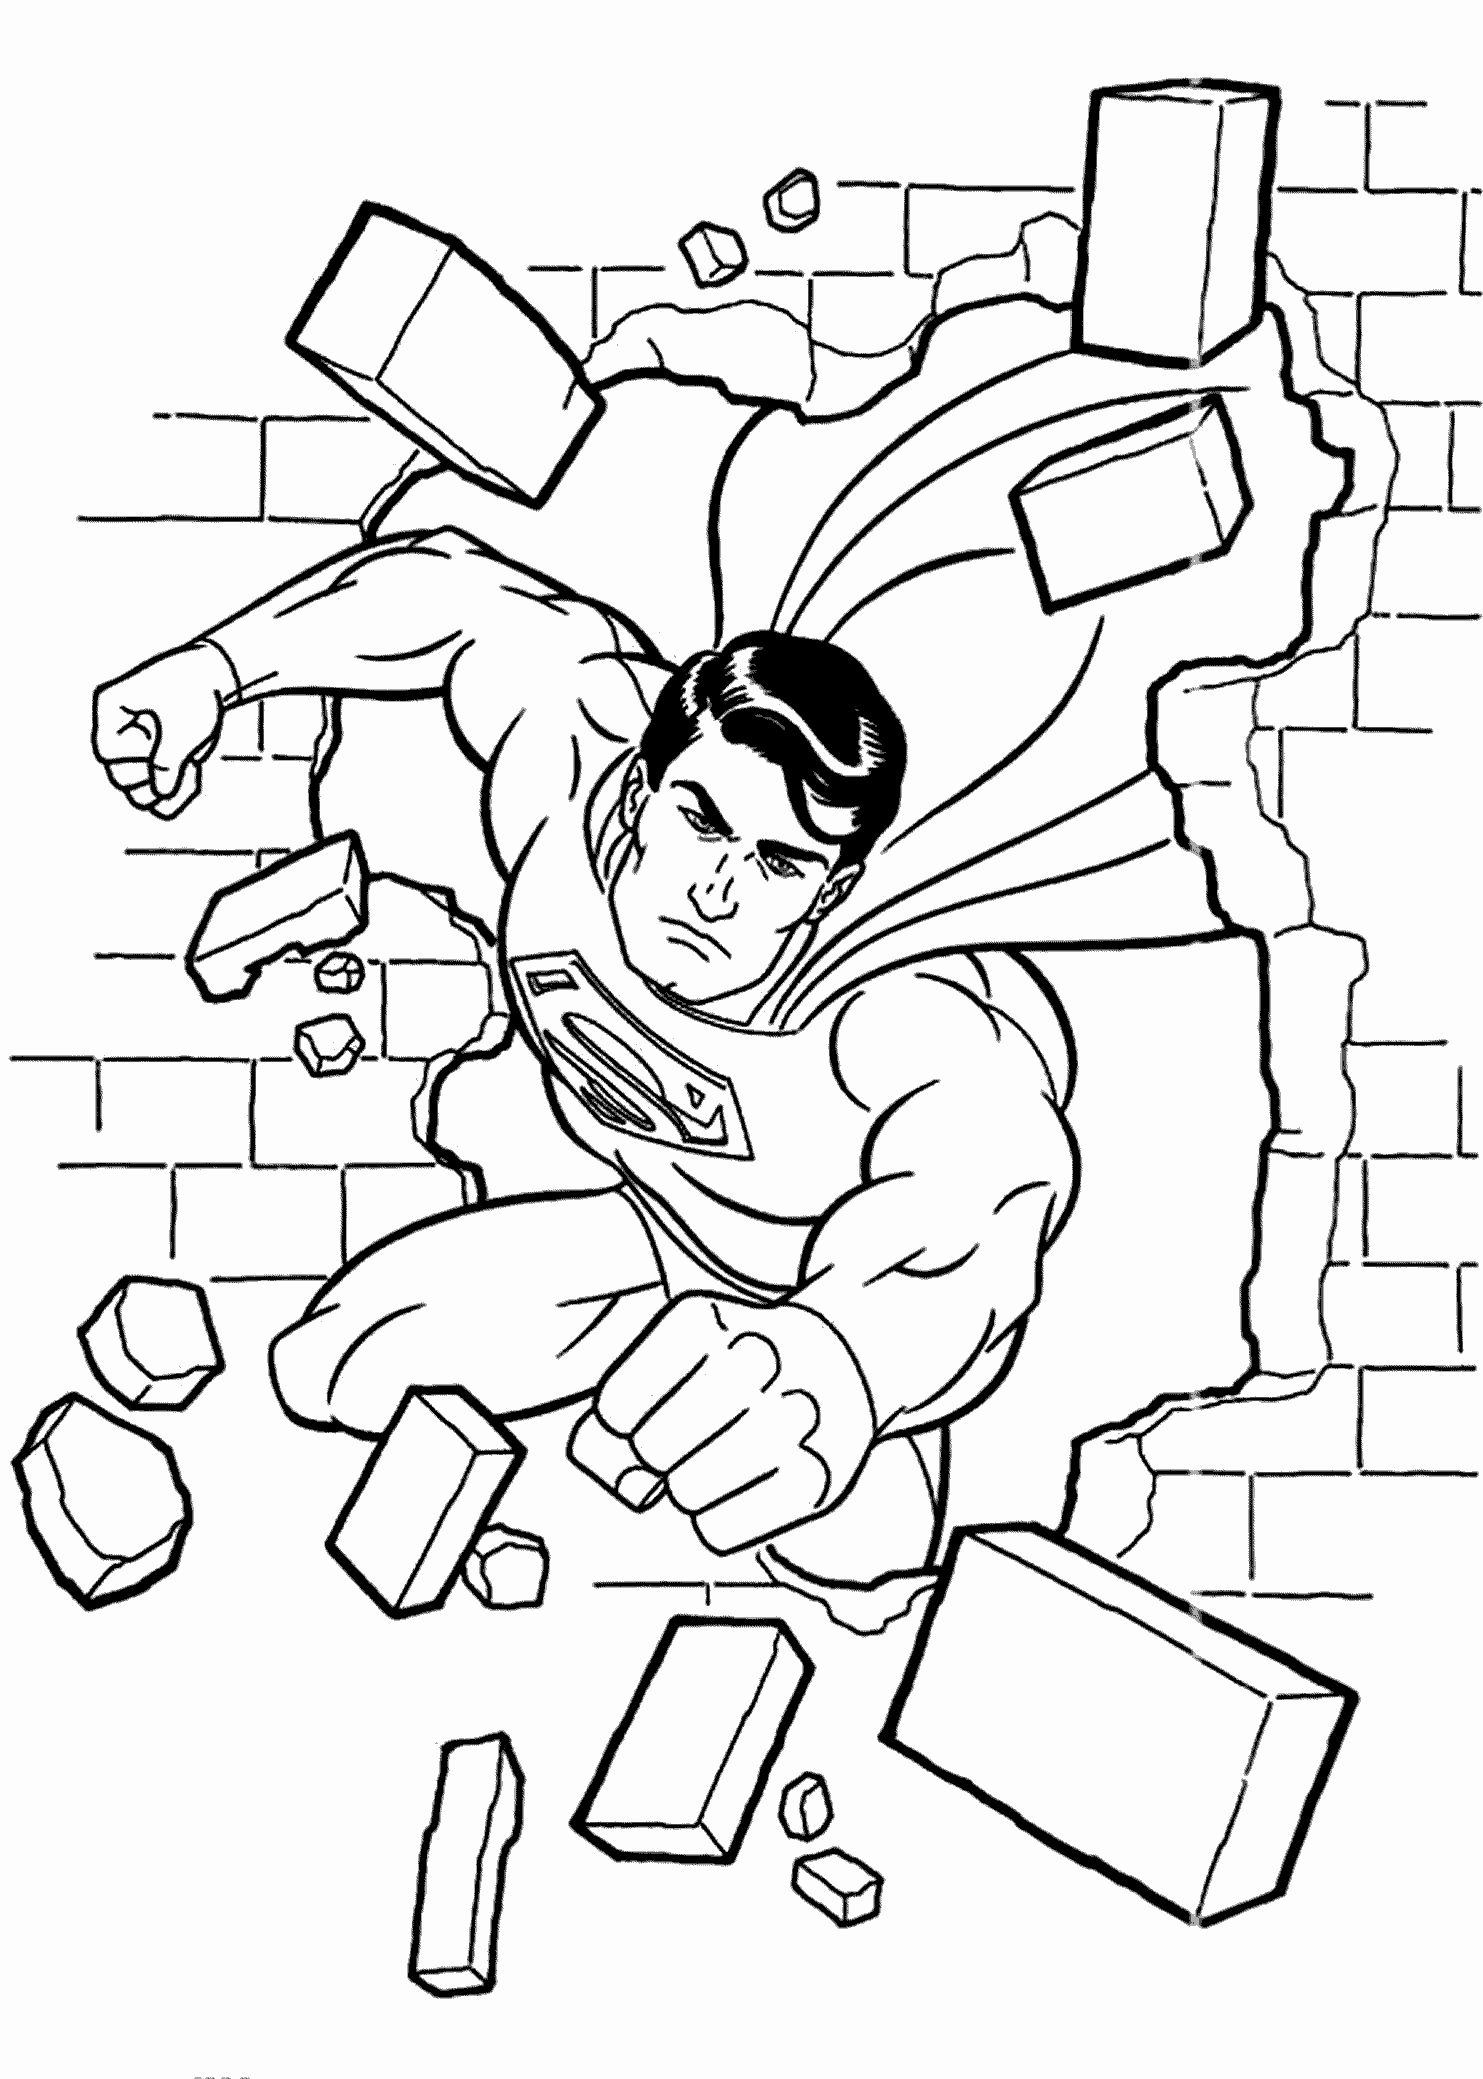 Superhero Coloring Books Inspirational Superman Coloring Pages Free Superhero Coloring Pages Superman Coloring Pages Superhero Coloring